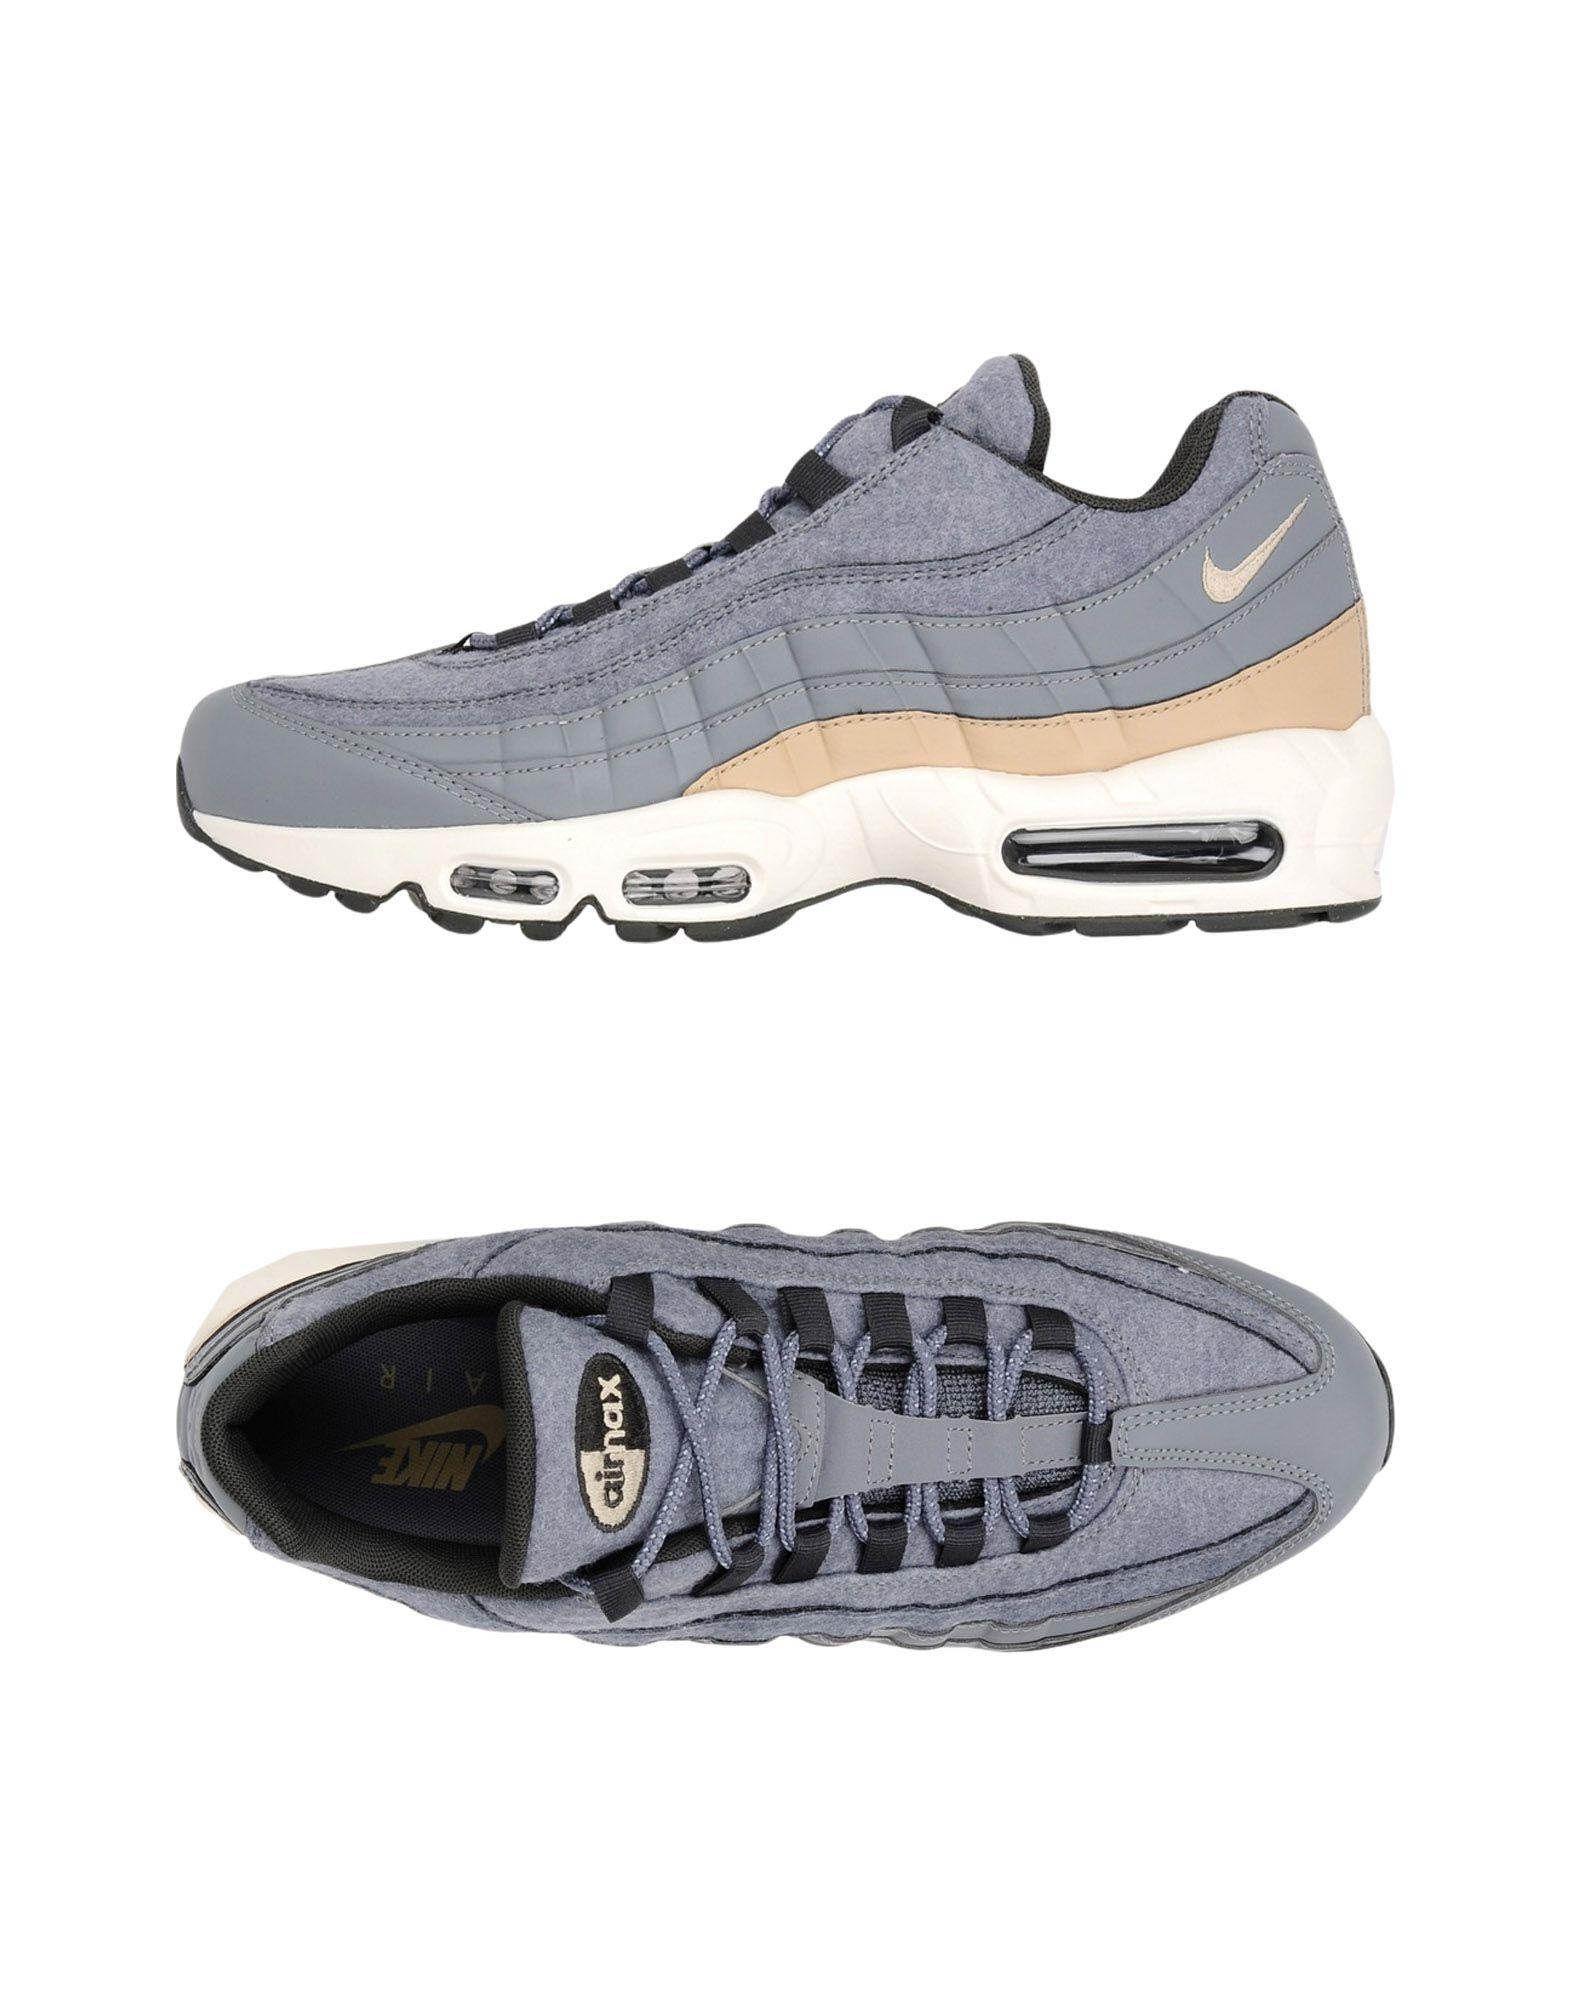 Nike Air Max 95 Premium 11375514VG  11375514VG Premium be0b54